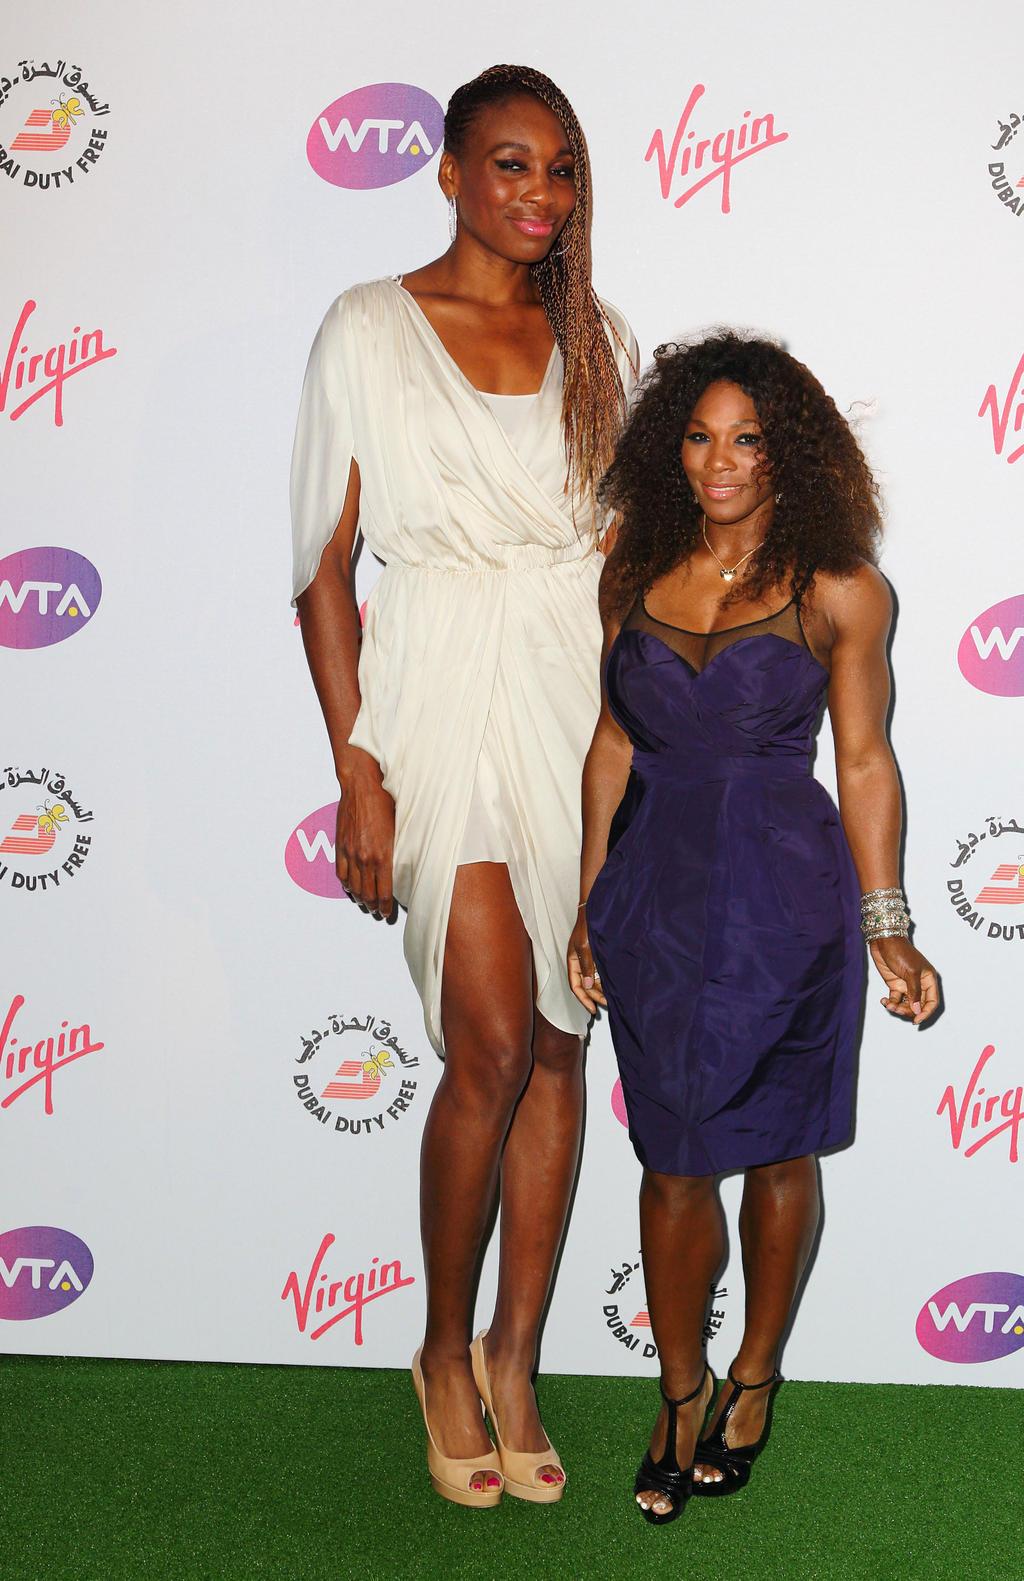 Venus and Serena Williams by lowerrider